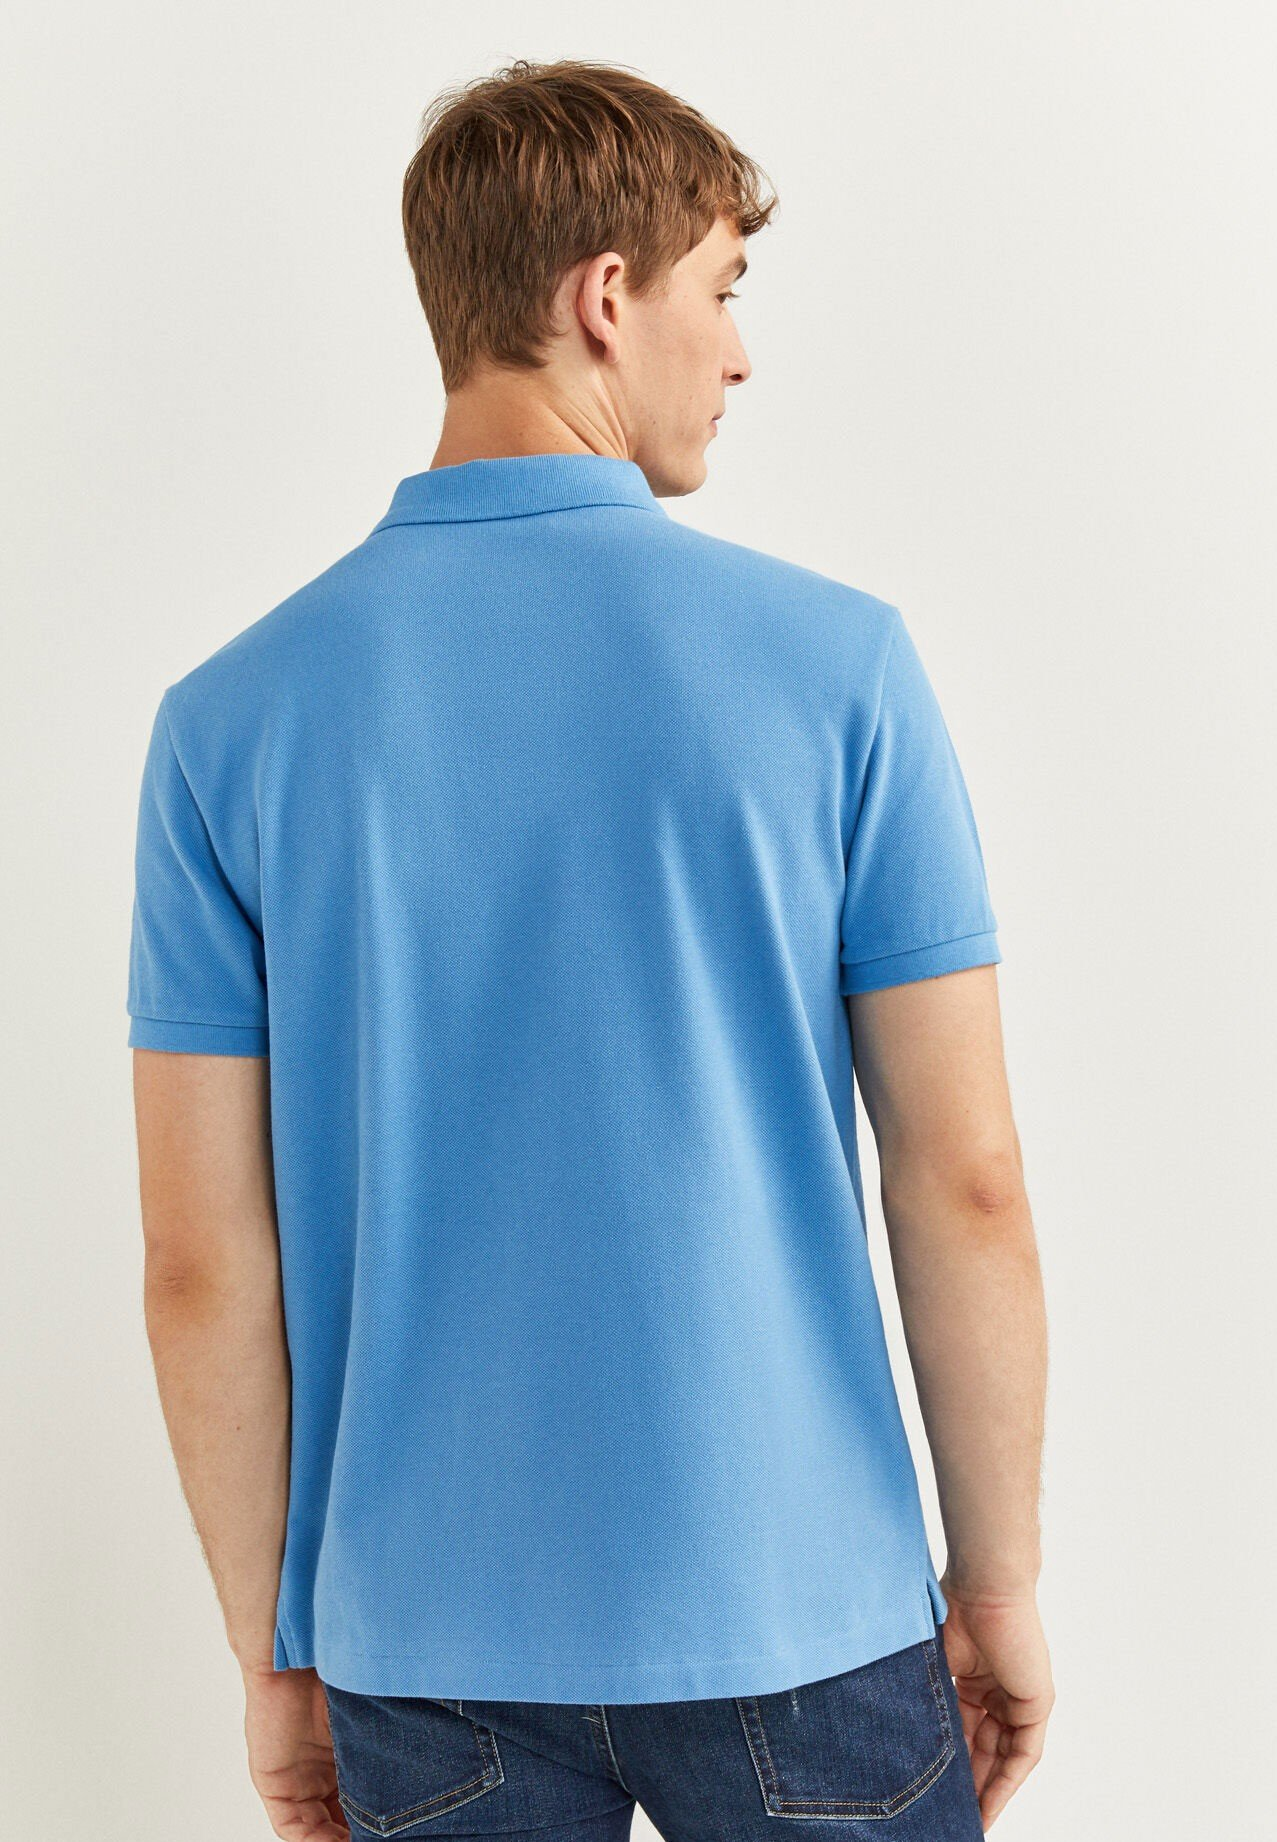 Springfield Fashion Mens Polo T-Shirt Color Sky Blue